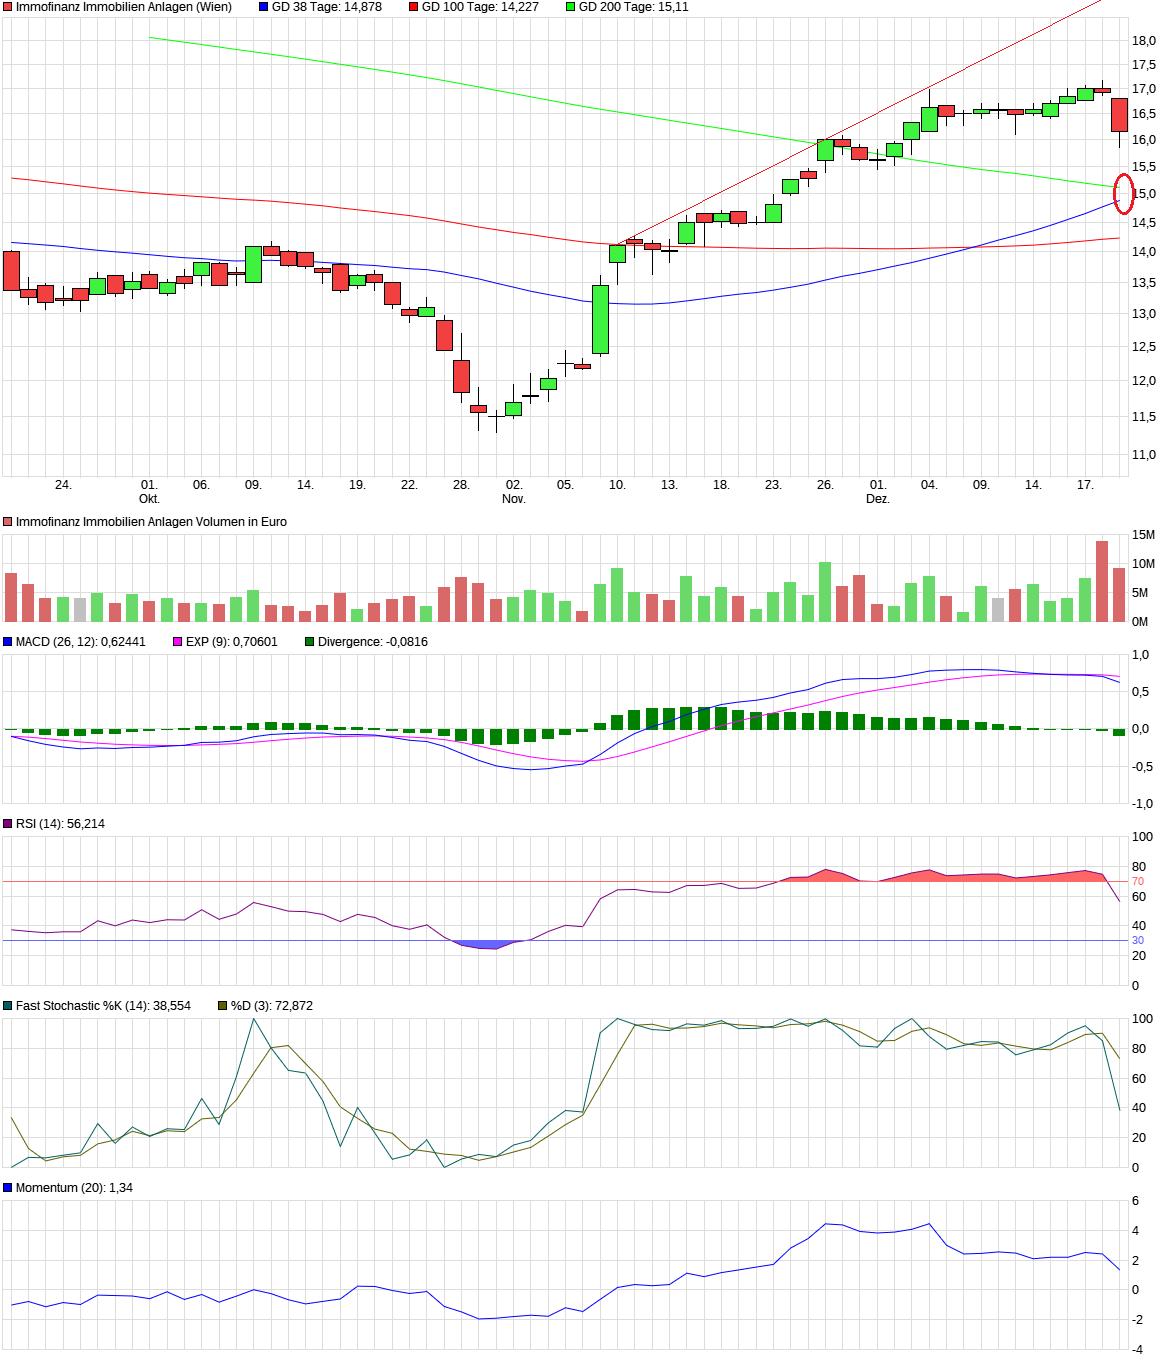 chart_quarter_immofinanzimmobilienanlagen.png